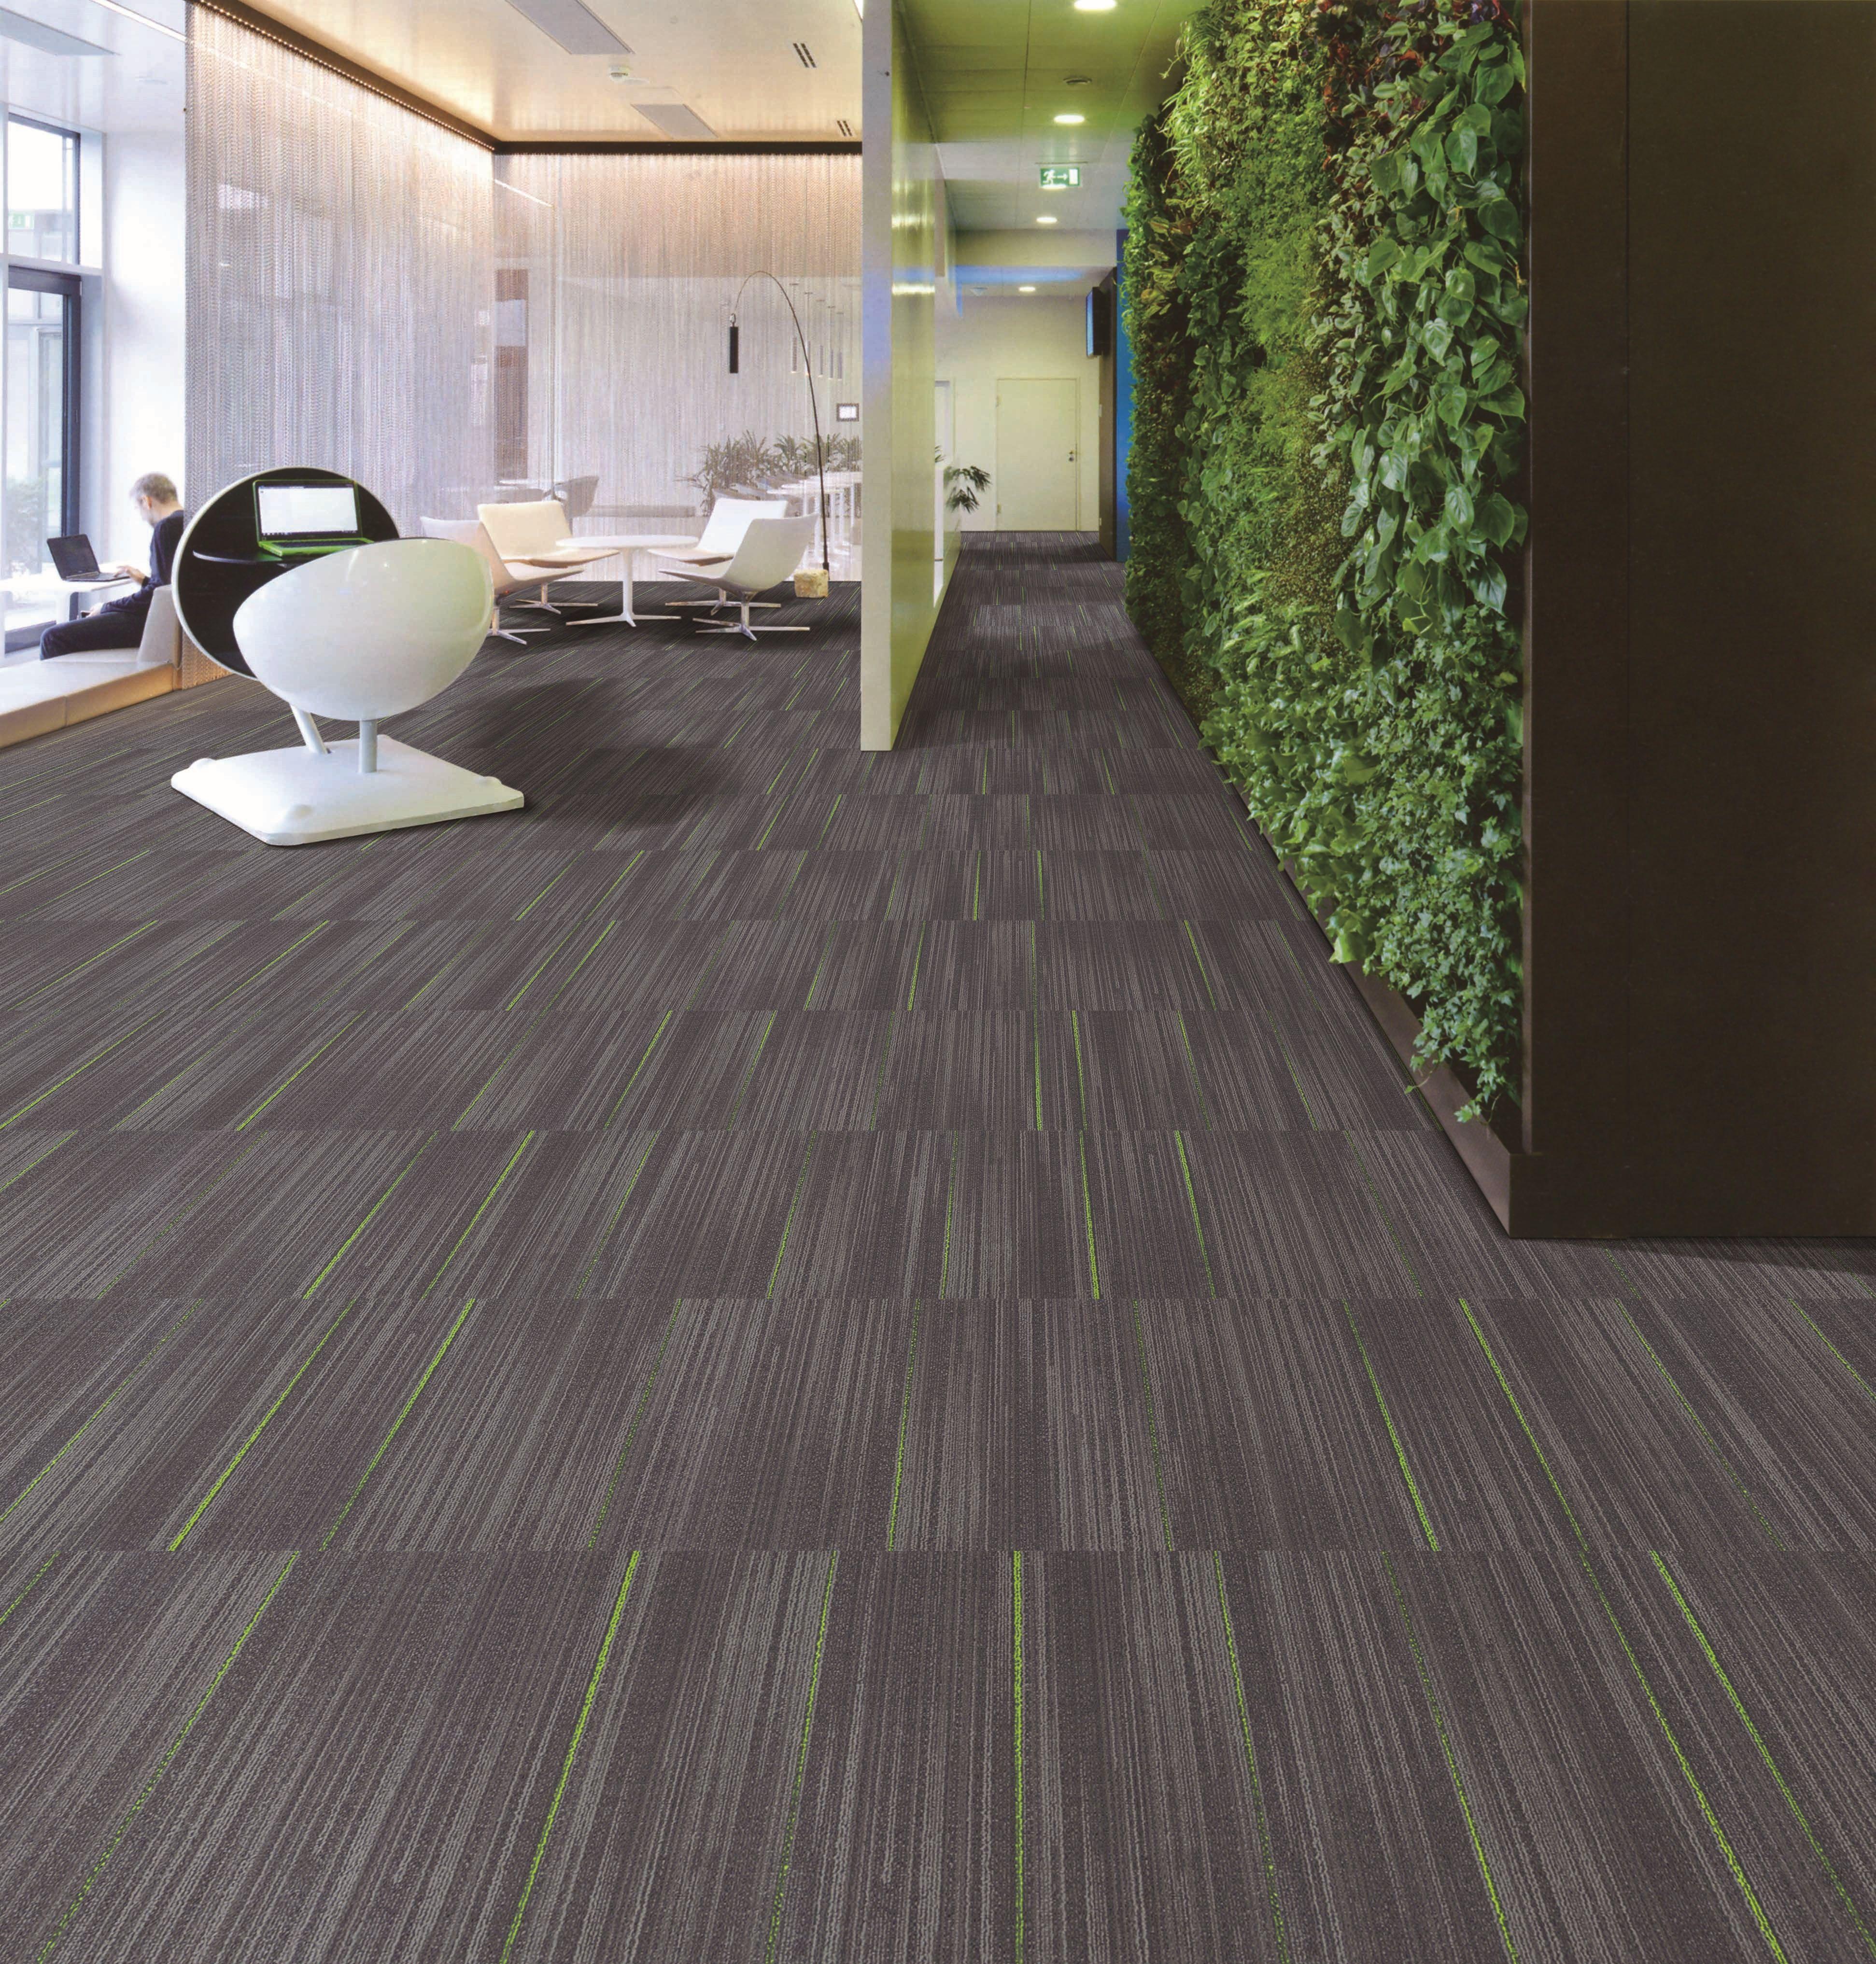 Elegant durable and beautifully tactile urbanlight carpet elegant durable and beautifully tactile urbanlight carpet tiles dailygadgetfo Choice Image